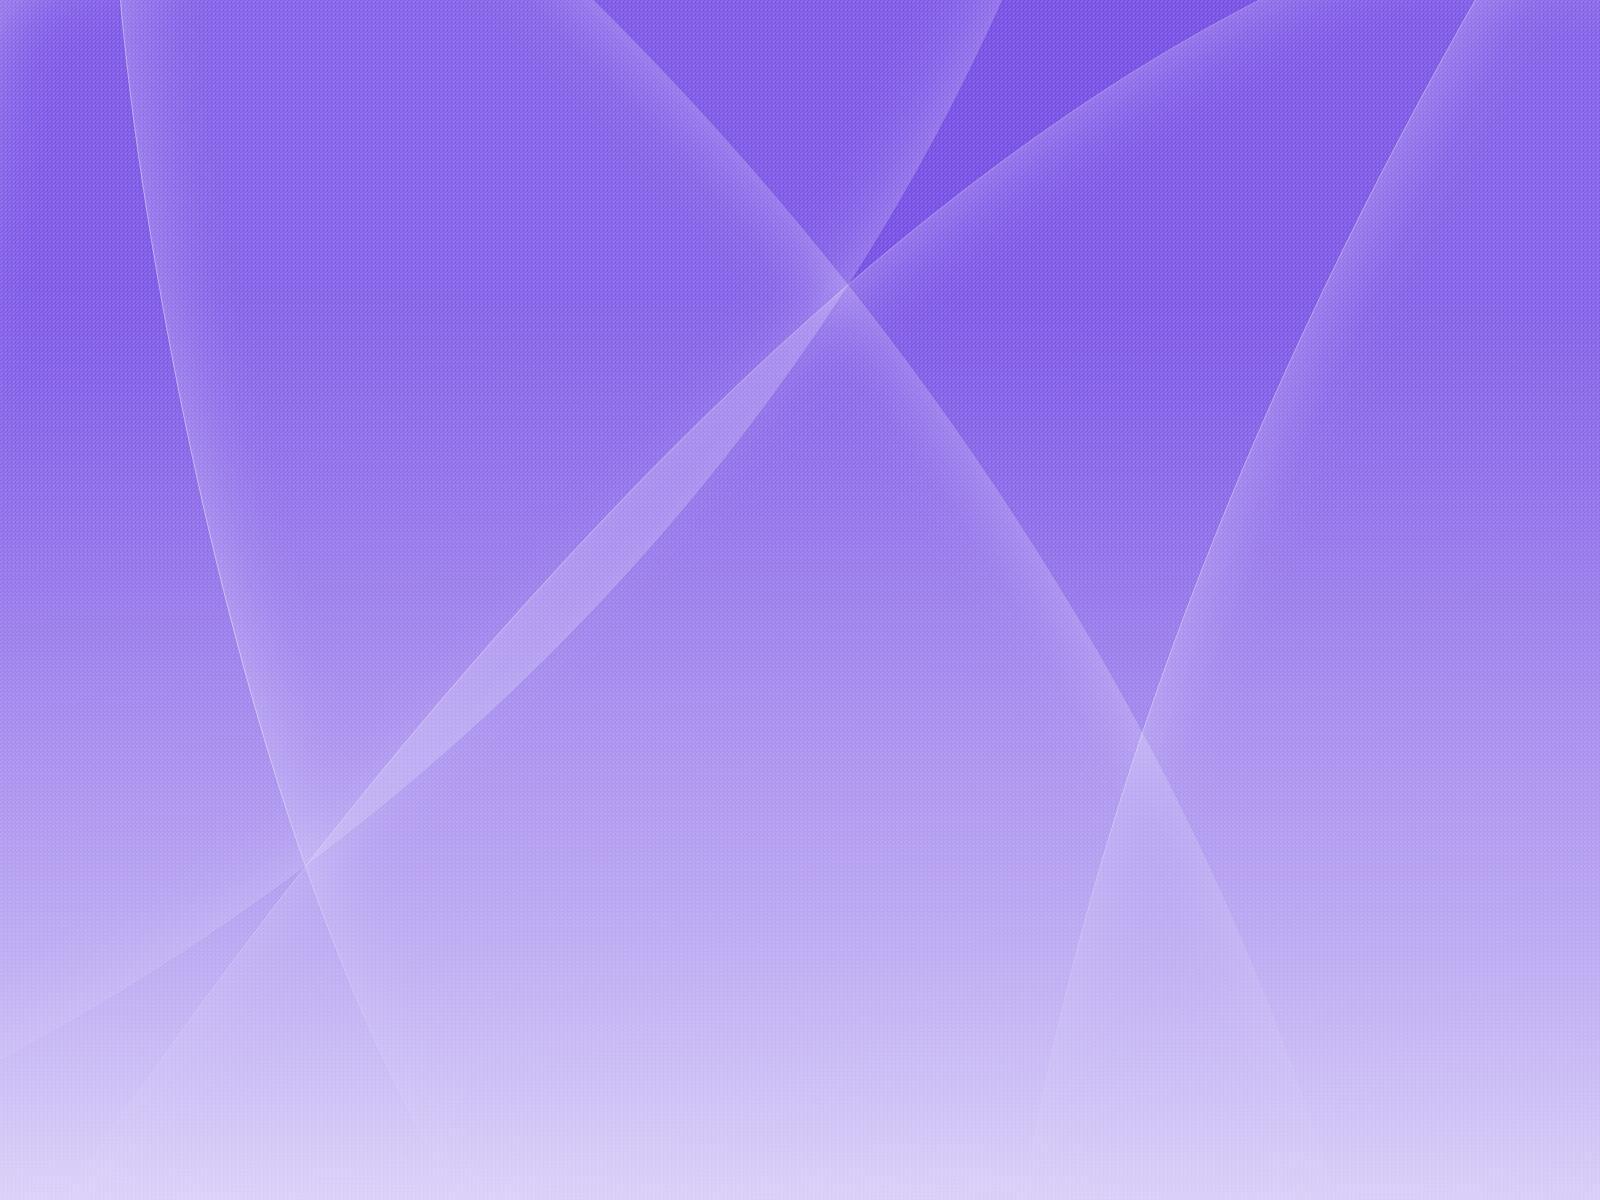 Purple Background Hd Wallpapersafari